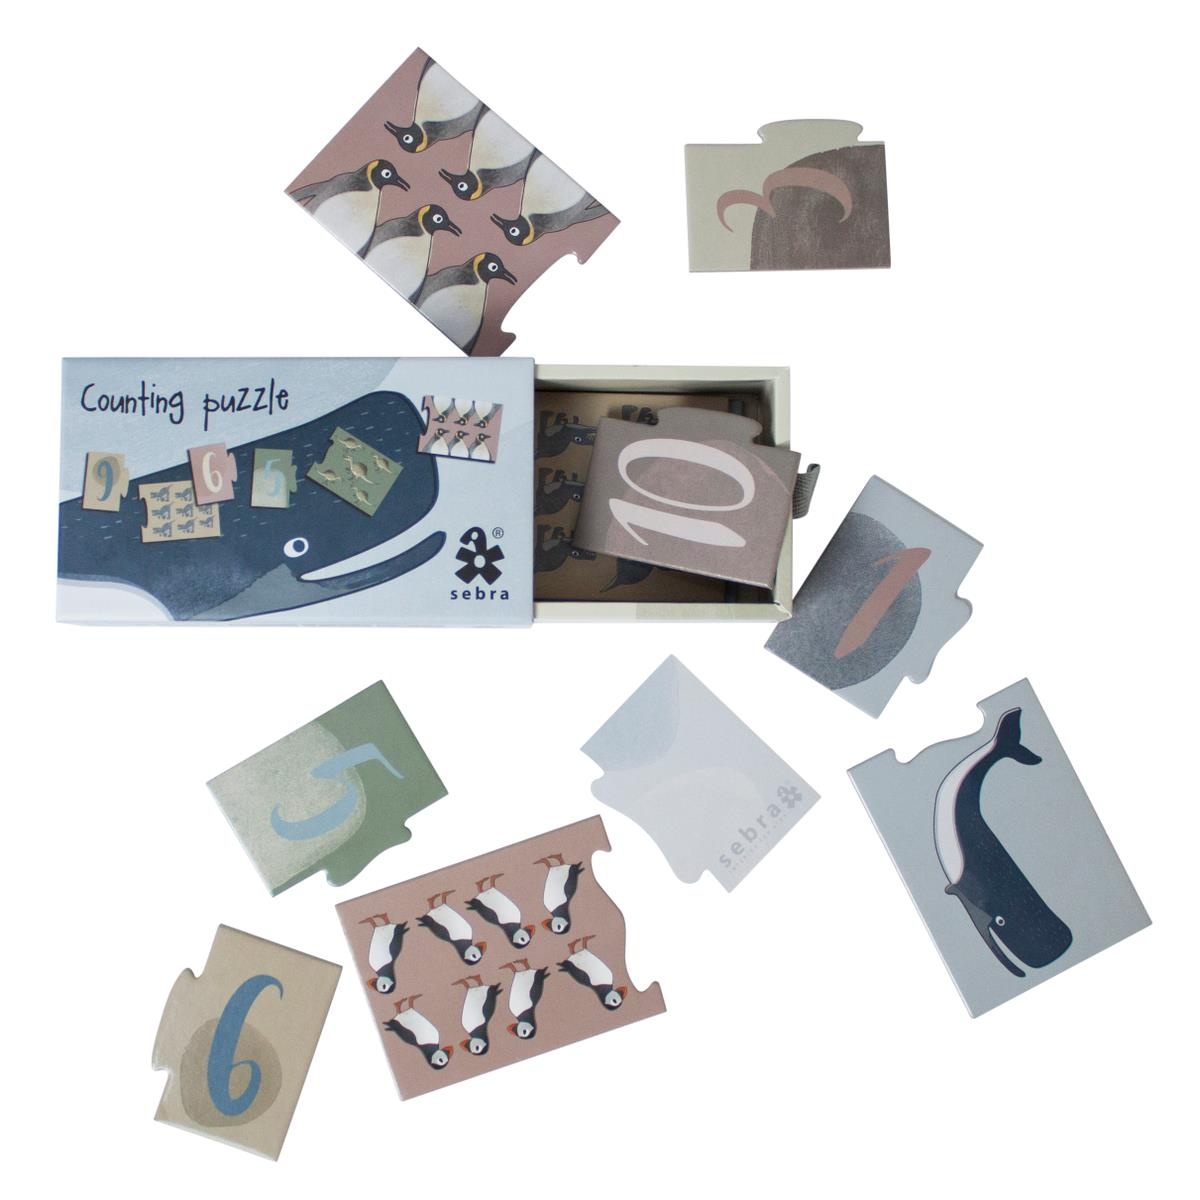 sebra Puzzle mit Zahlen, 1-10, Dino:Arctic animals 3015306 - 01